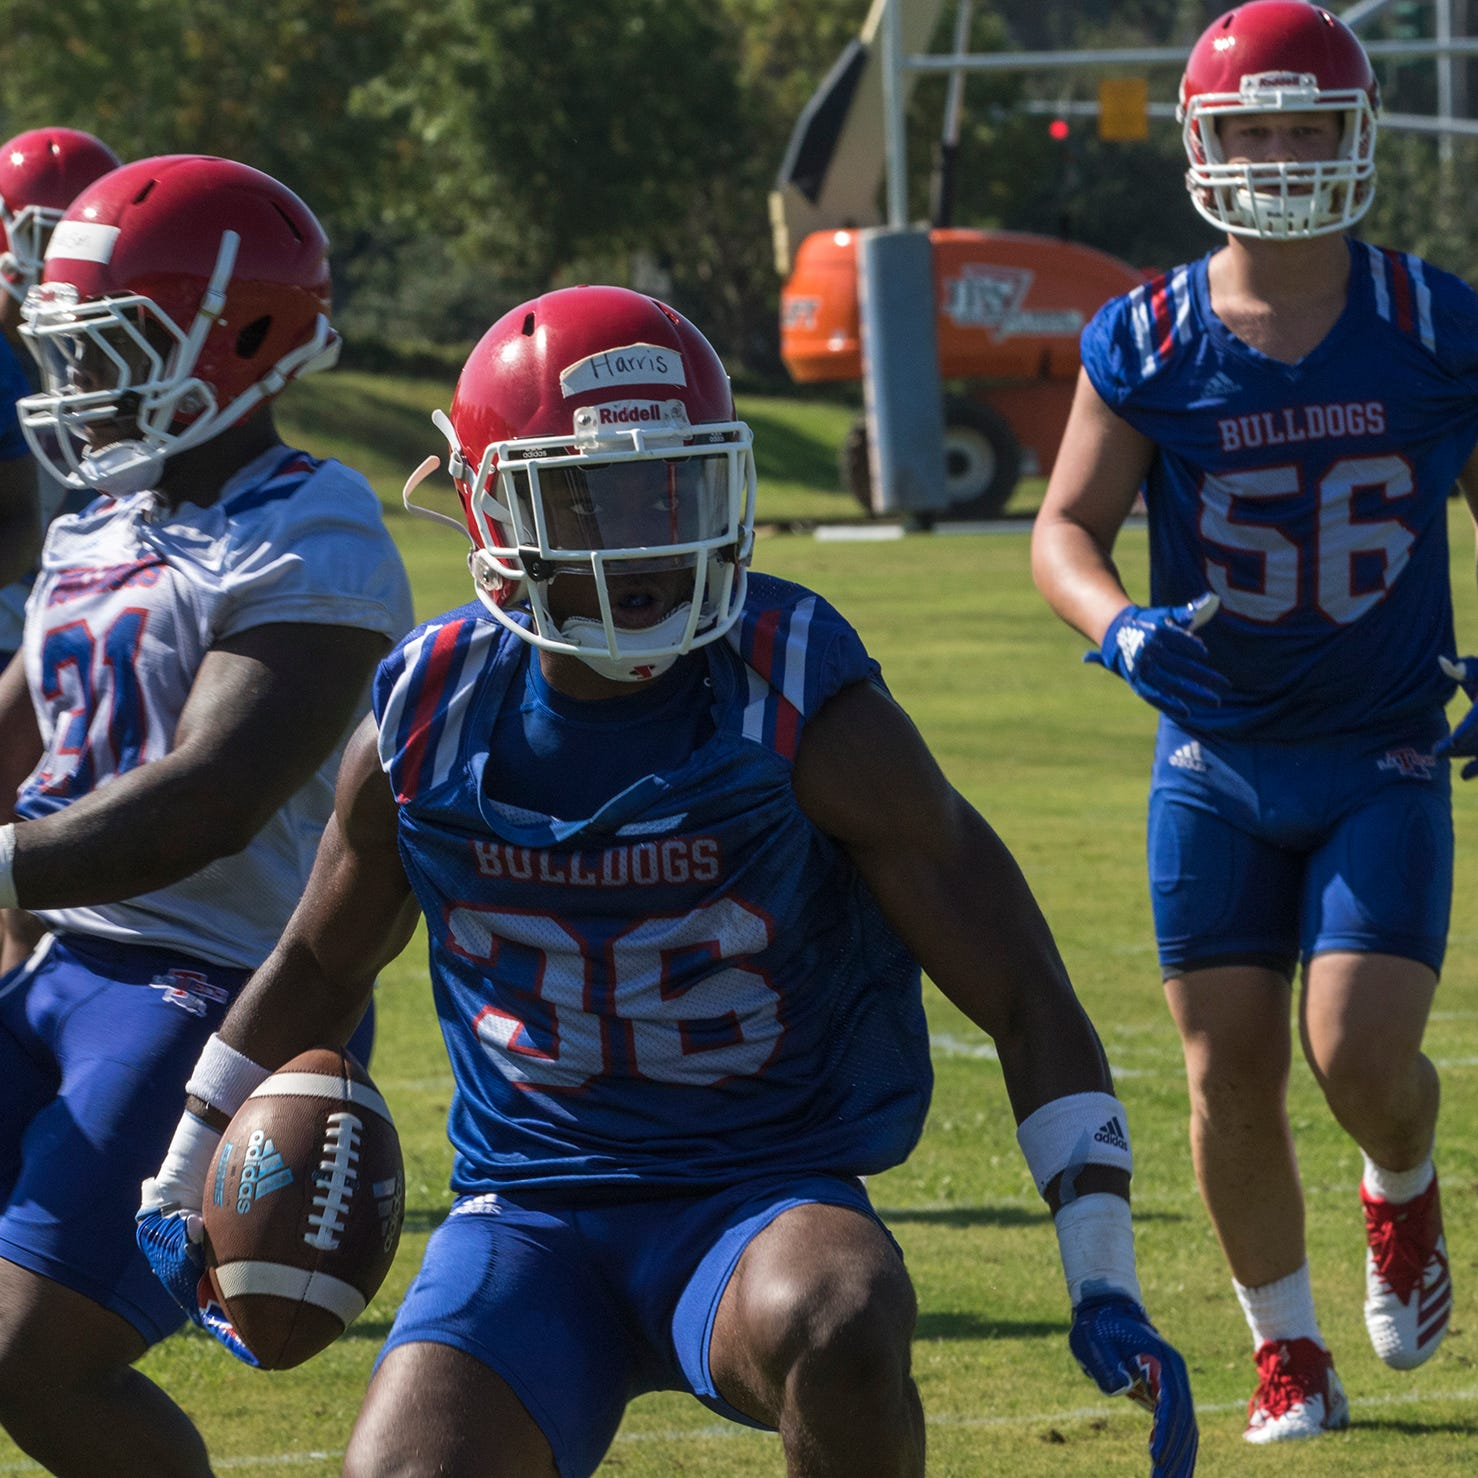 Who could be Louisiana Tech's next Amik Robertson?